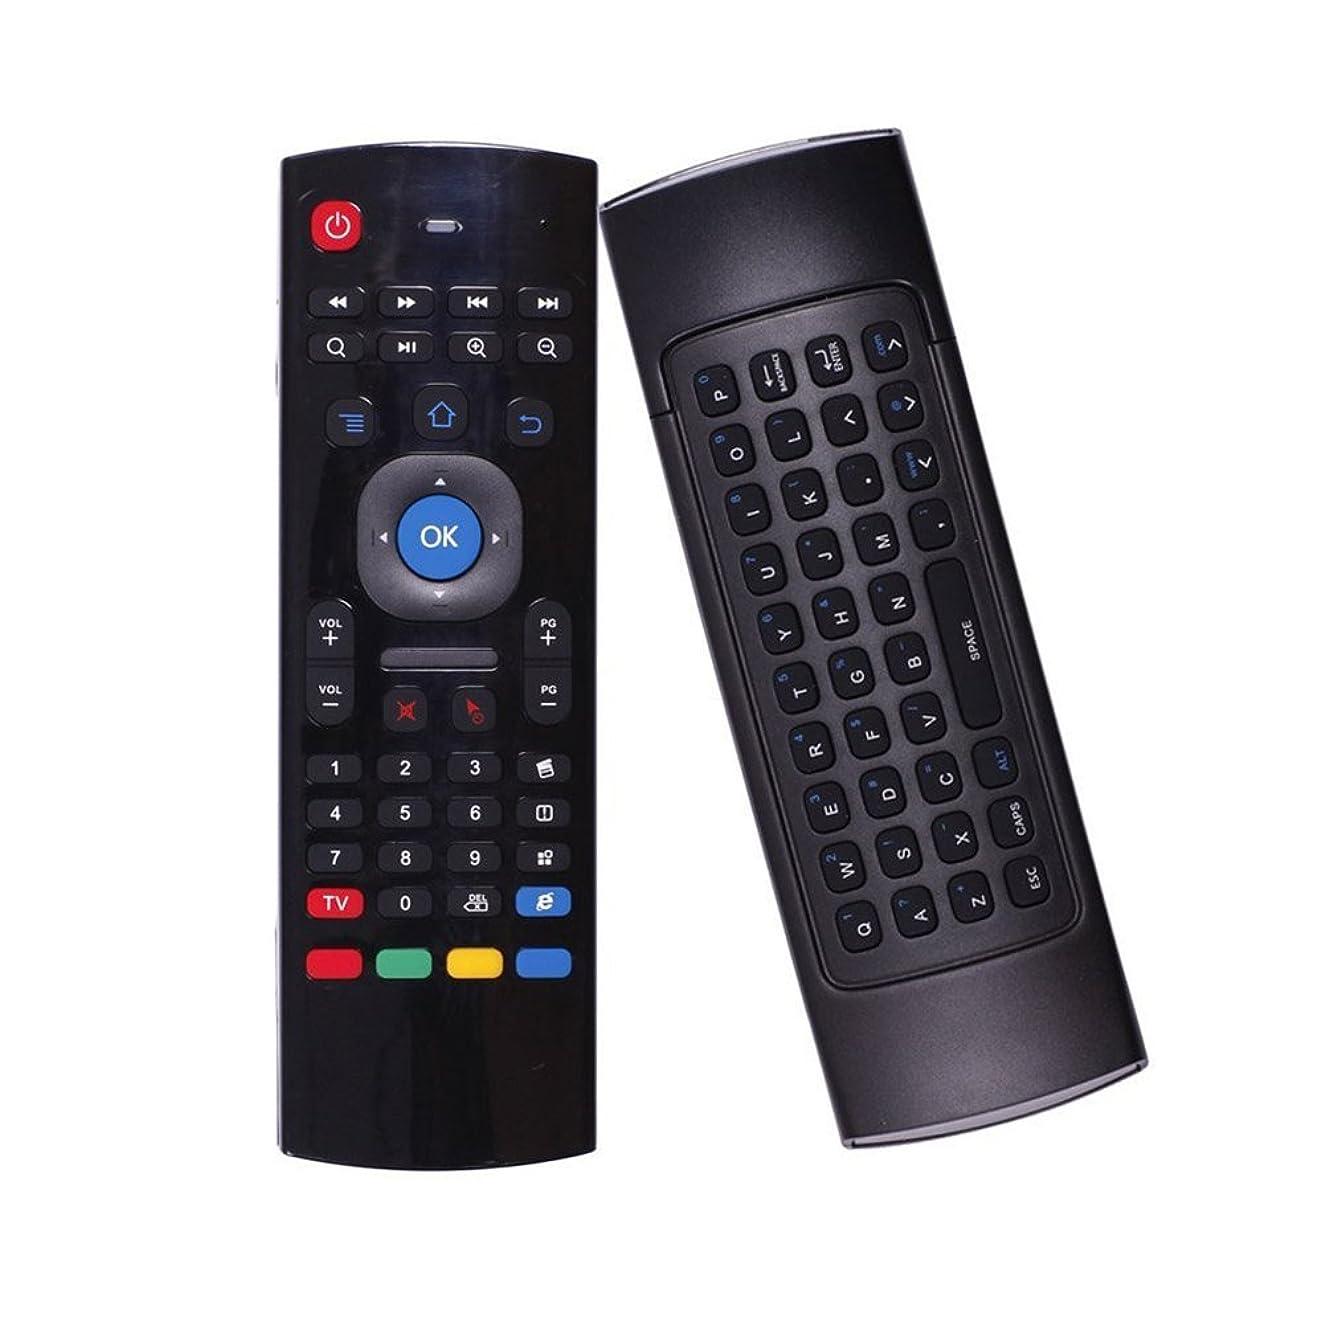 elegantstunning Air Mouse Smart Remote Control 2.4G RF Wireless Keyboard for TV Computer Black